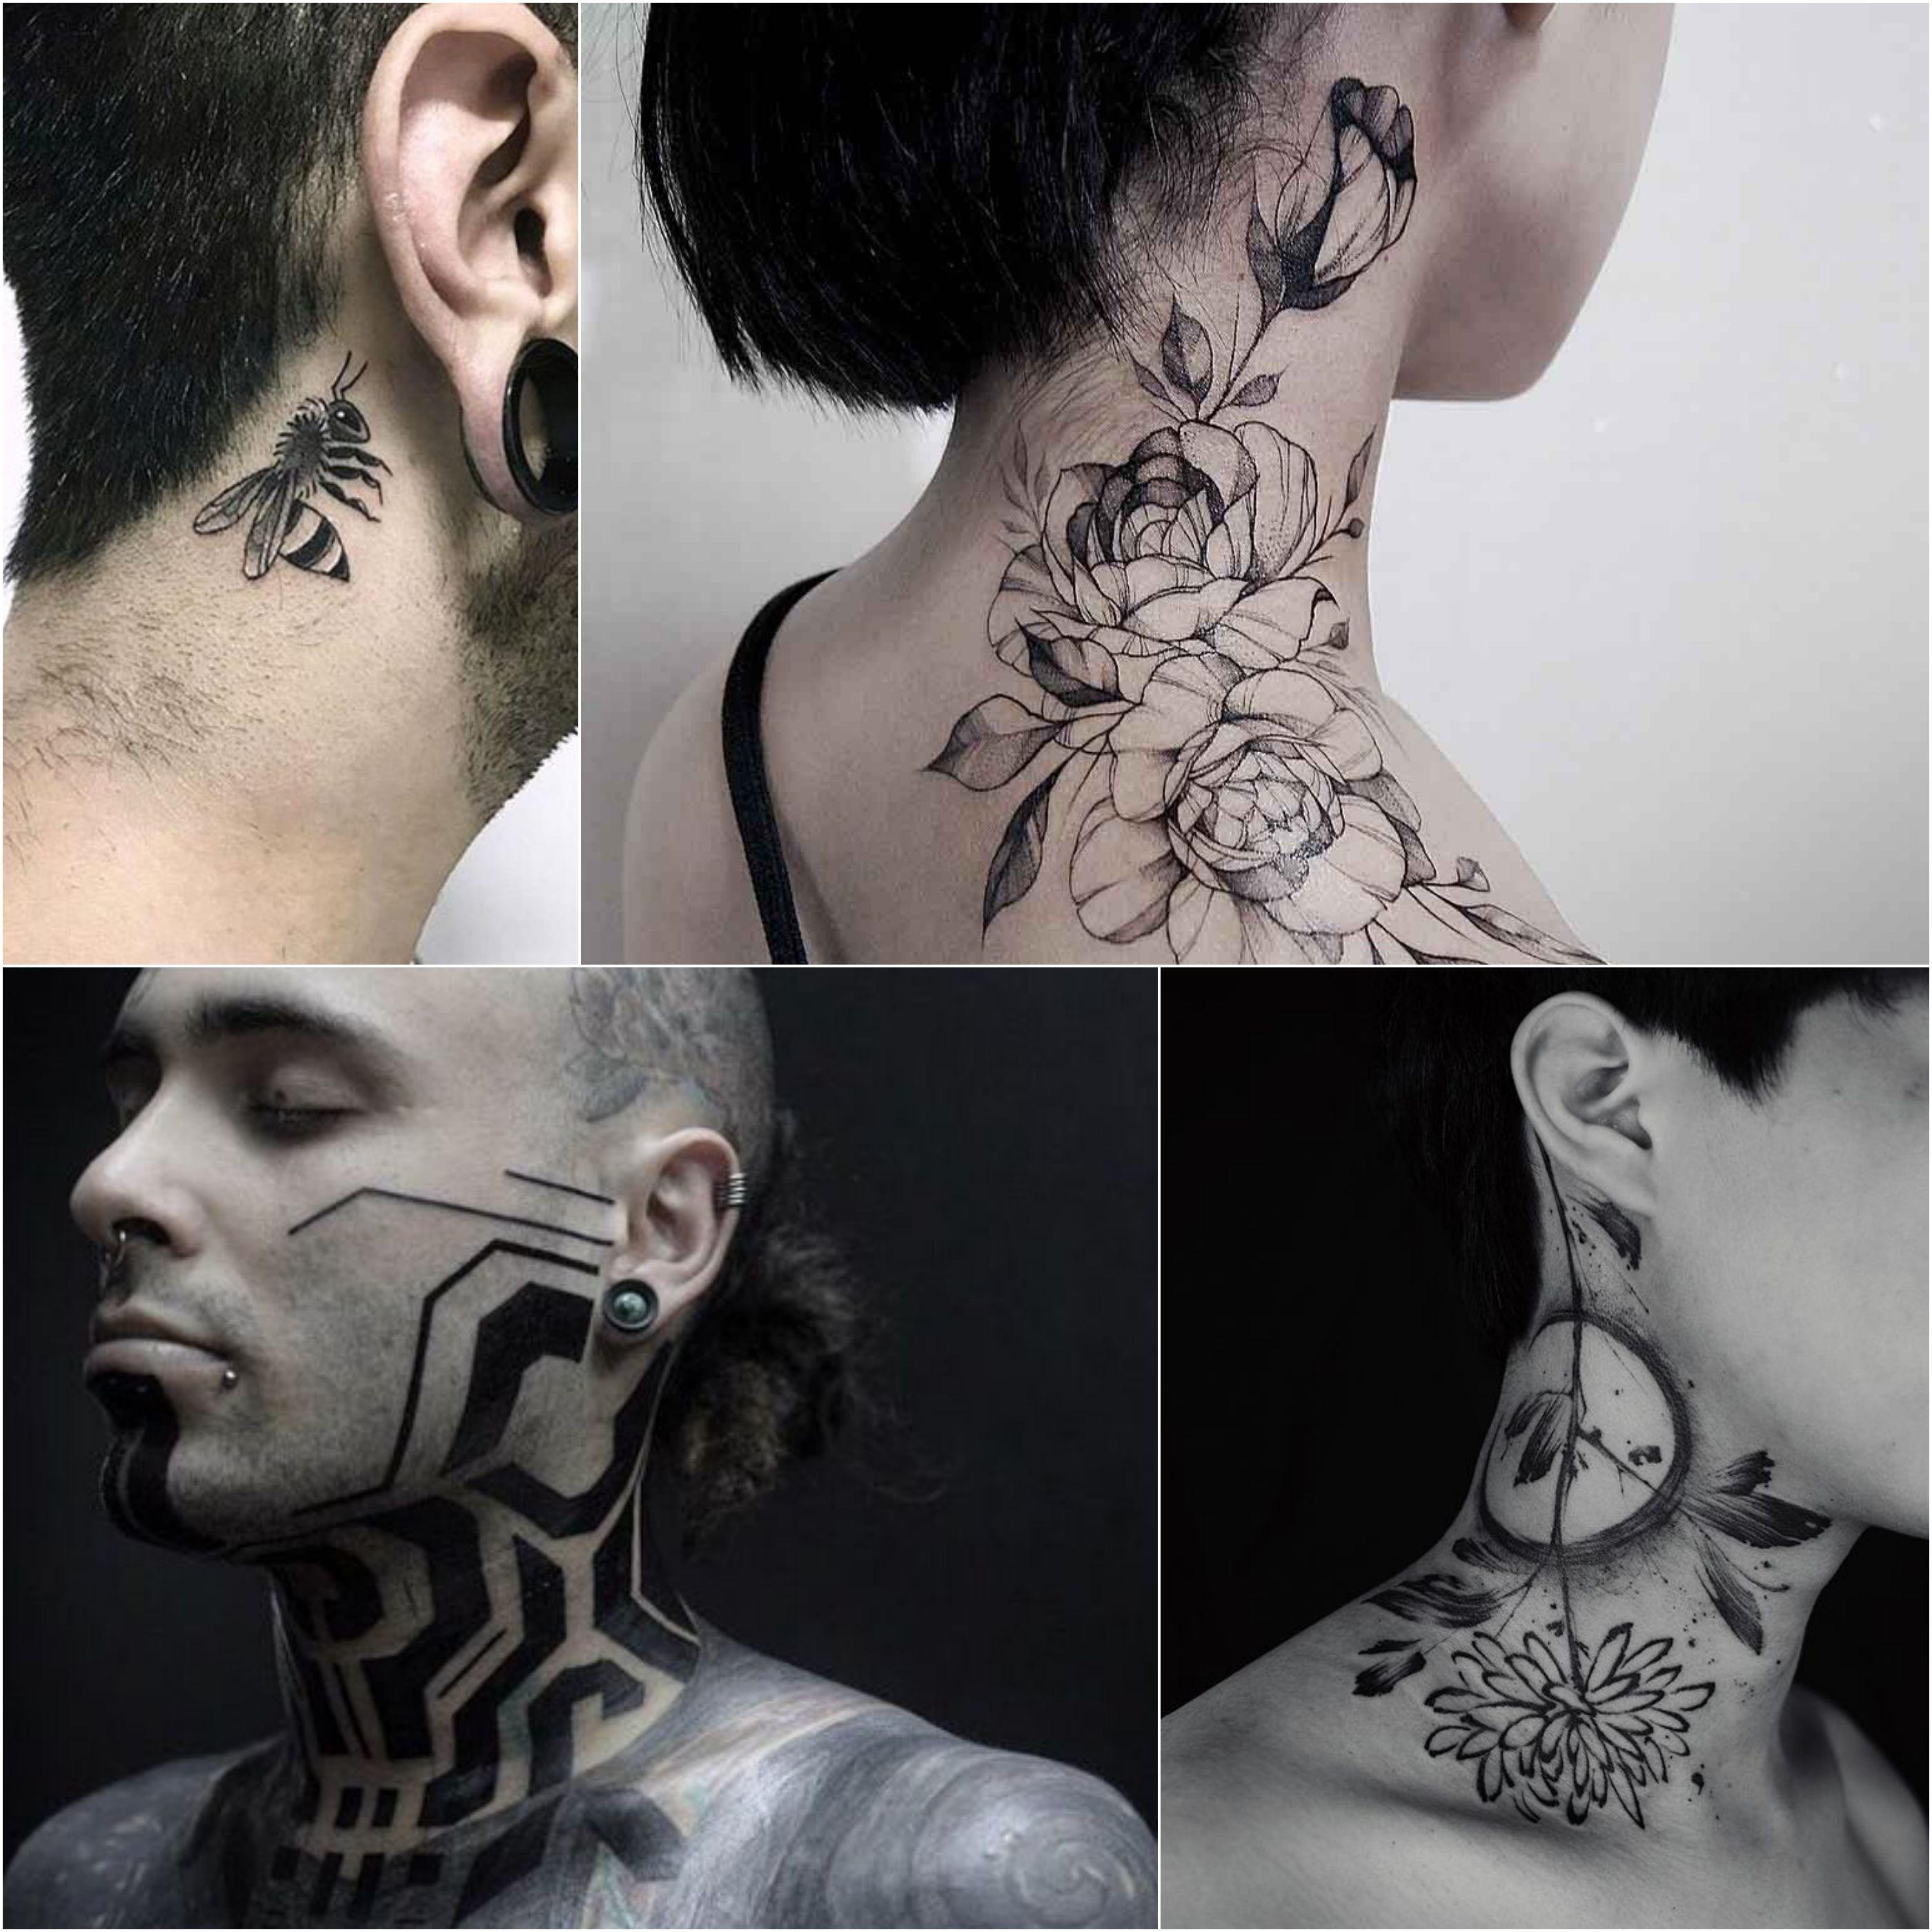 100 Best Neck Tattoo Designs Creative Neck Tattoo Ideas Gallery Side Neck Tattoo Best Neck Tattoos Girl Neck Tattoos